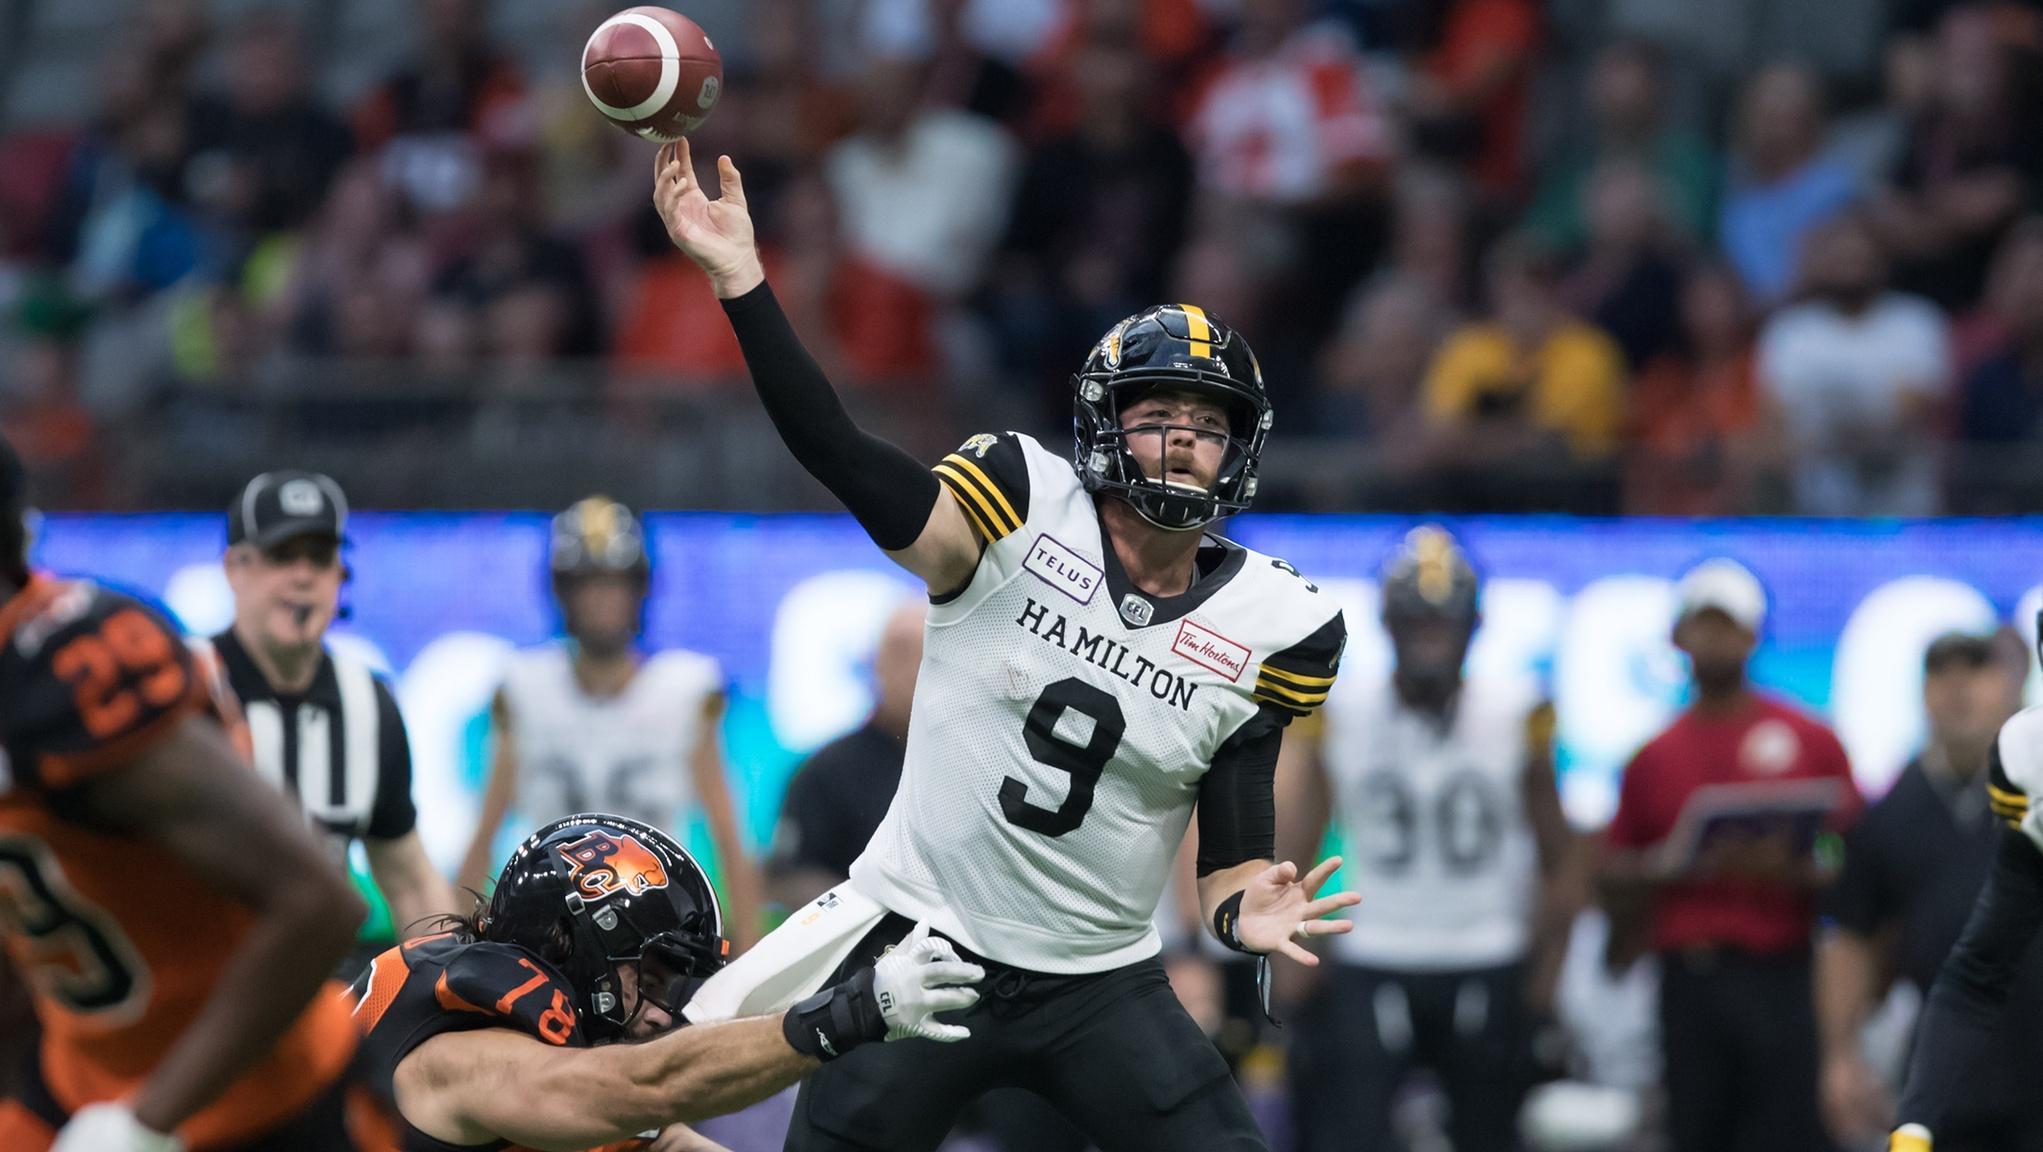 Ticats win defensive battle against Lions - CFL.ca